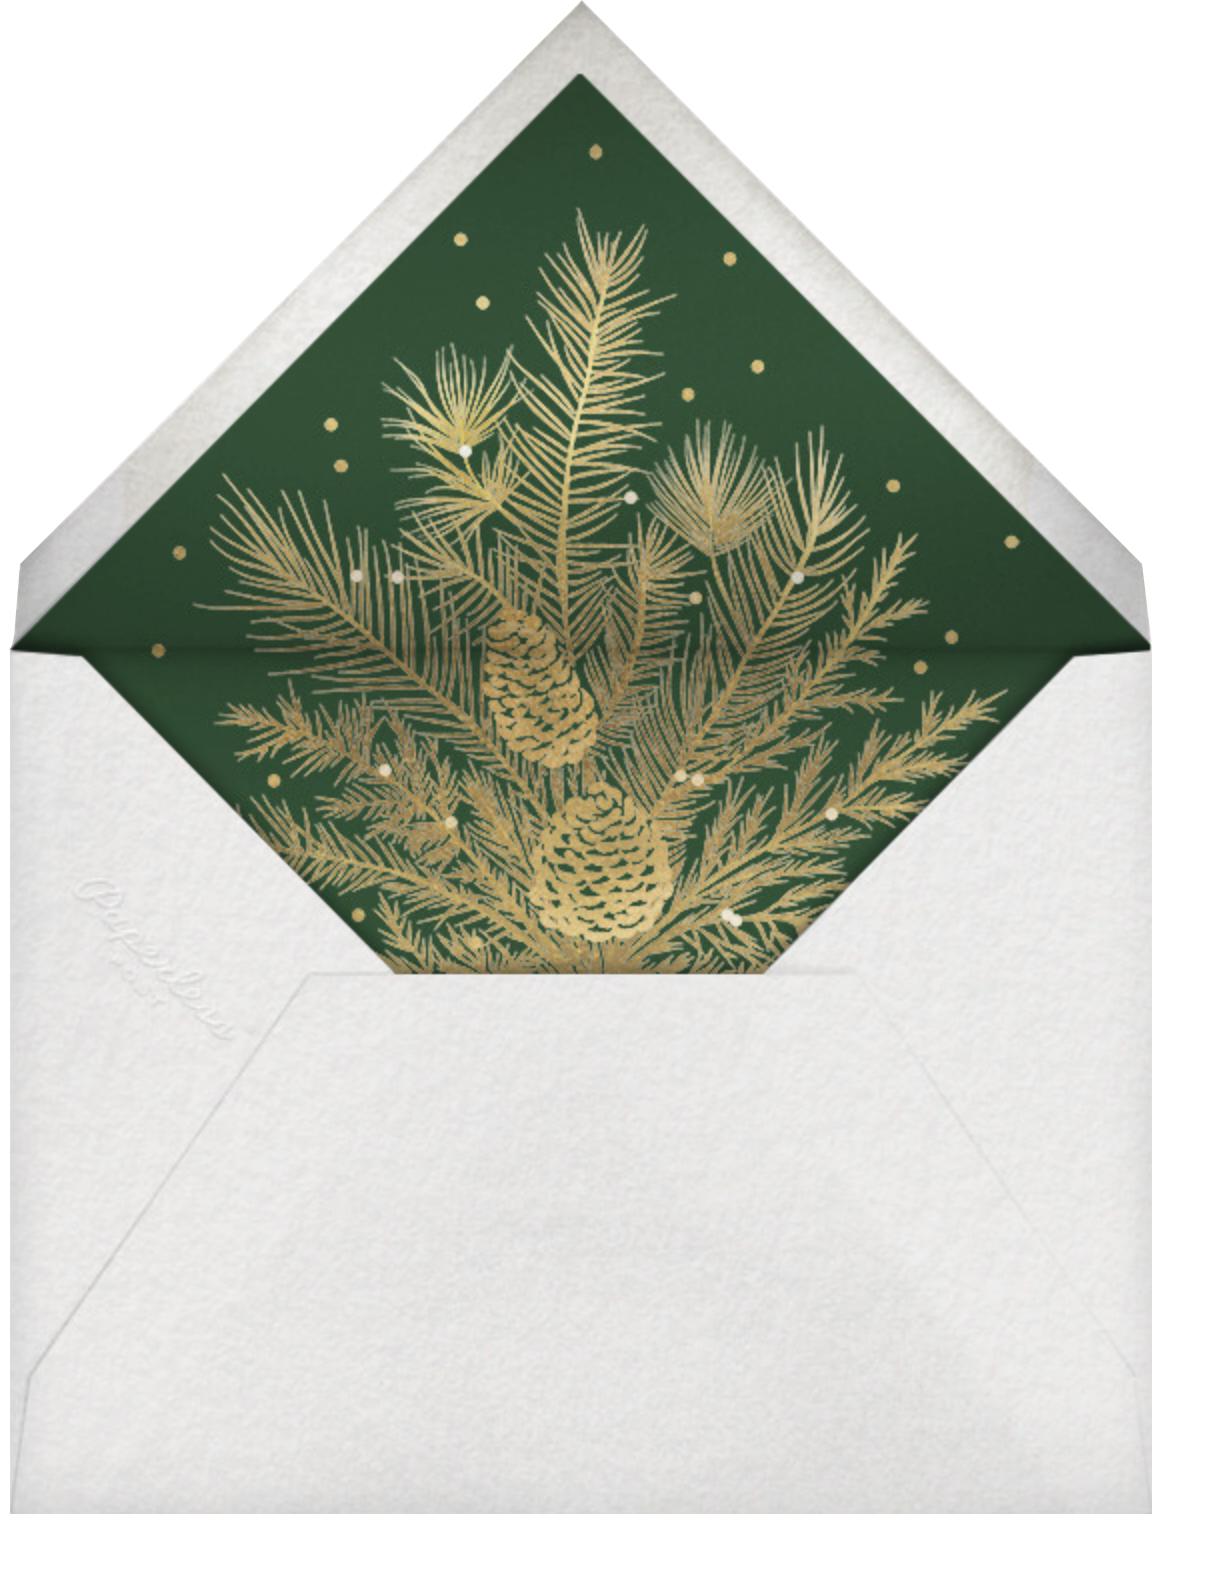 Whitework (8 Multi-Photo) - Gold - Paperless Post - Holiday cards - envelope back